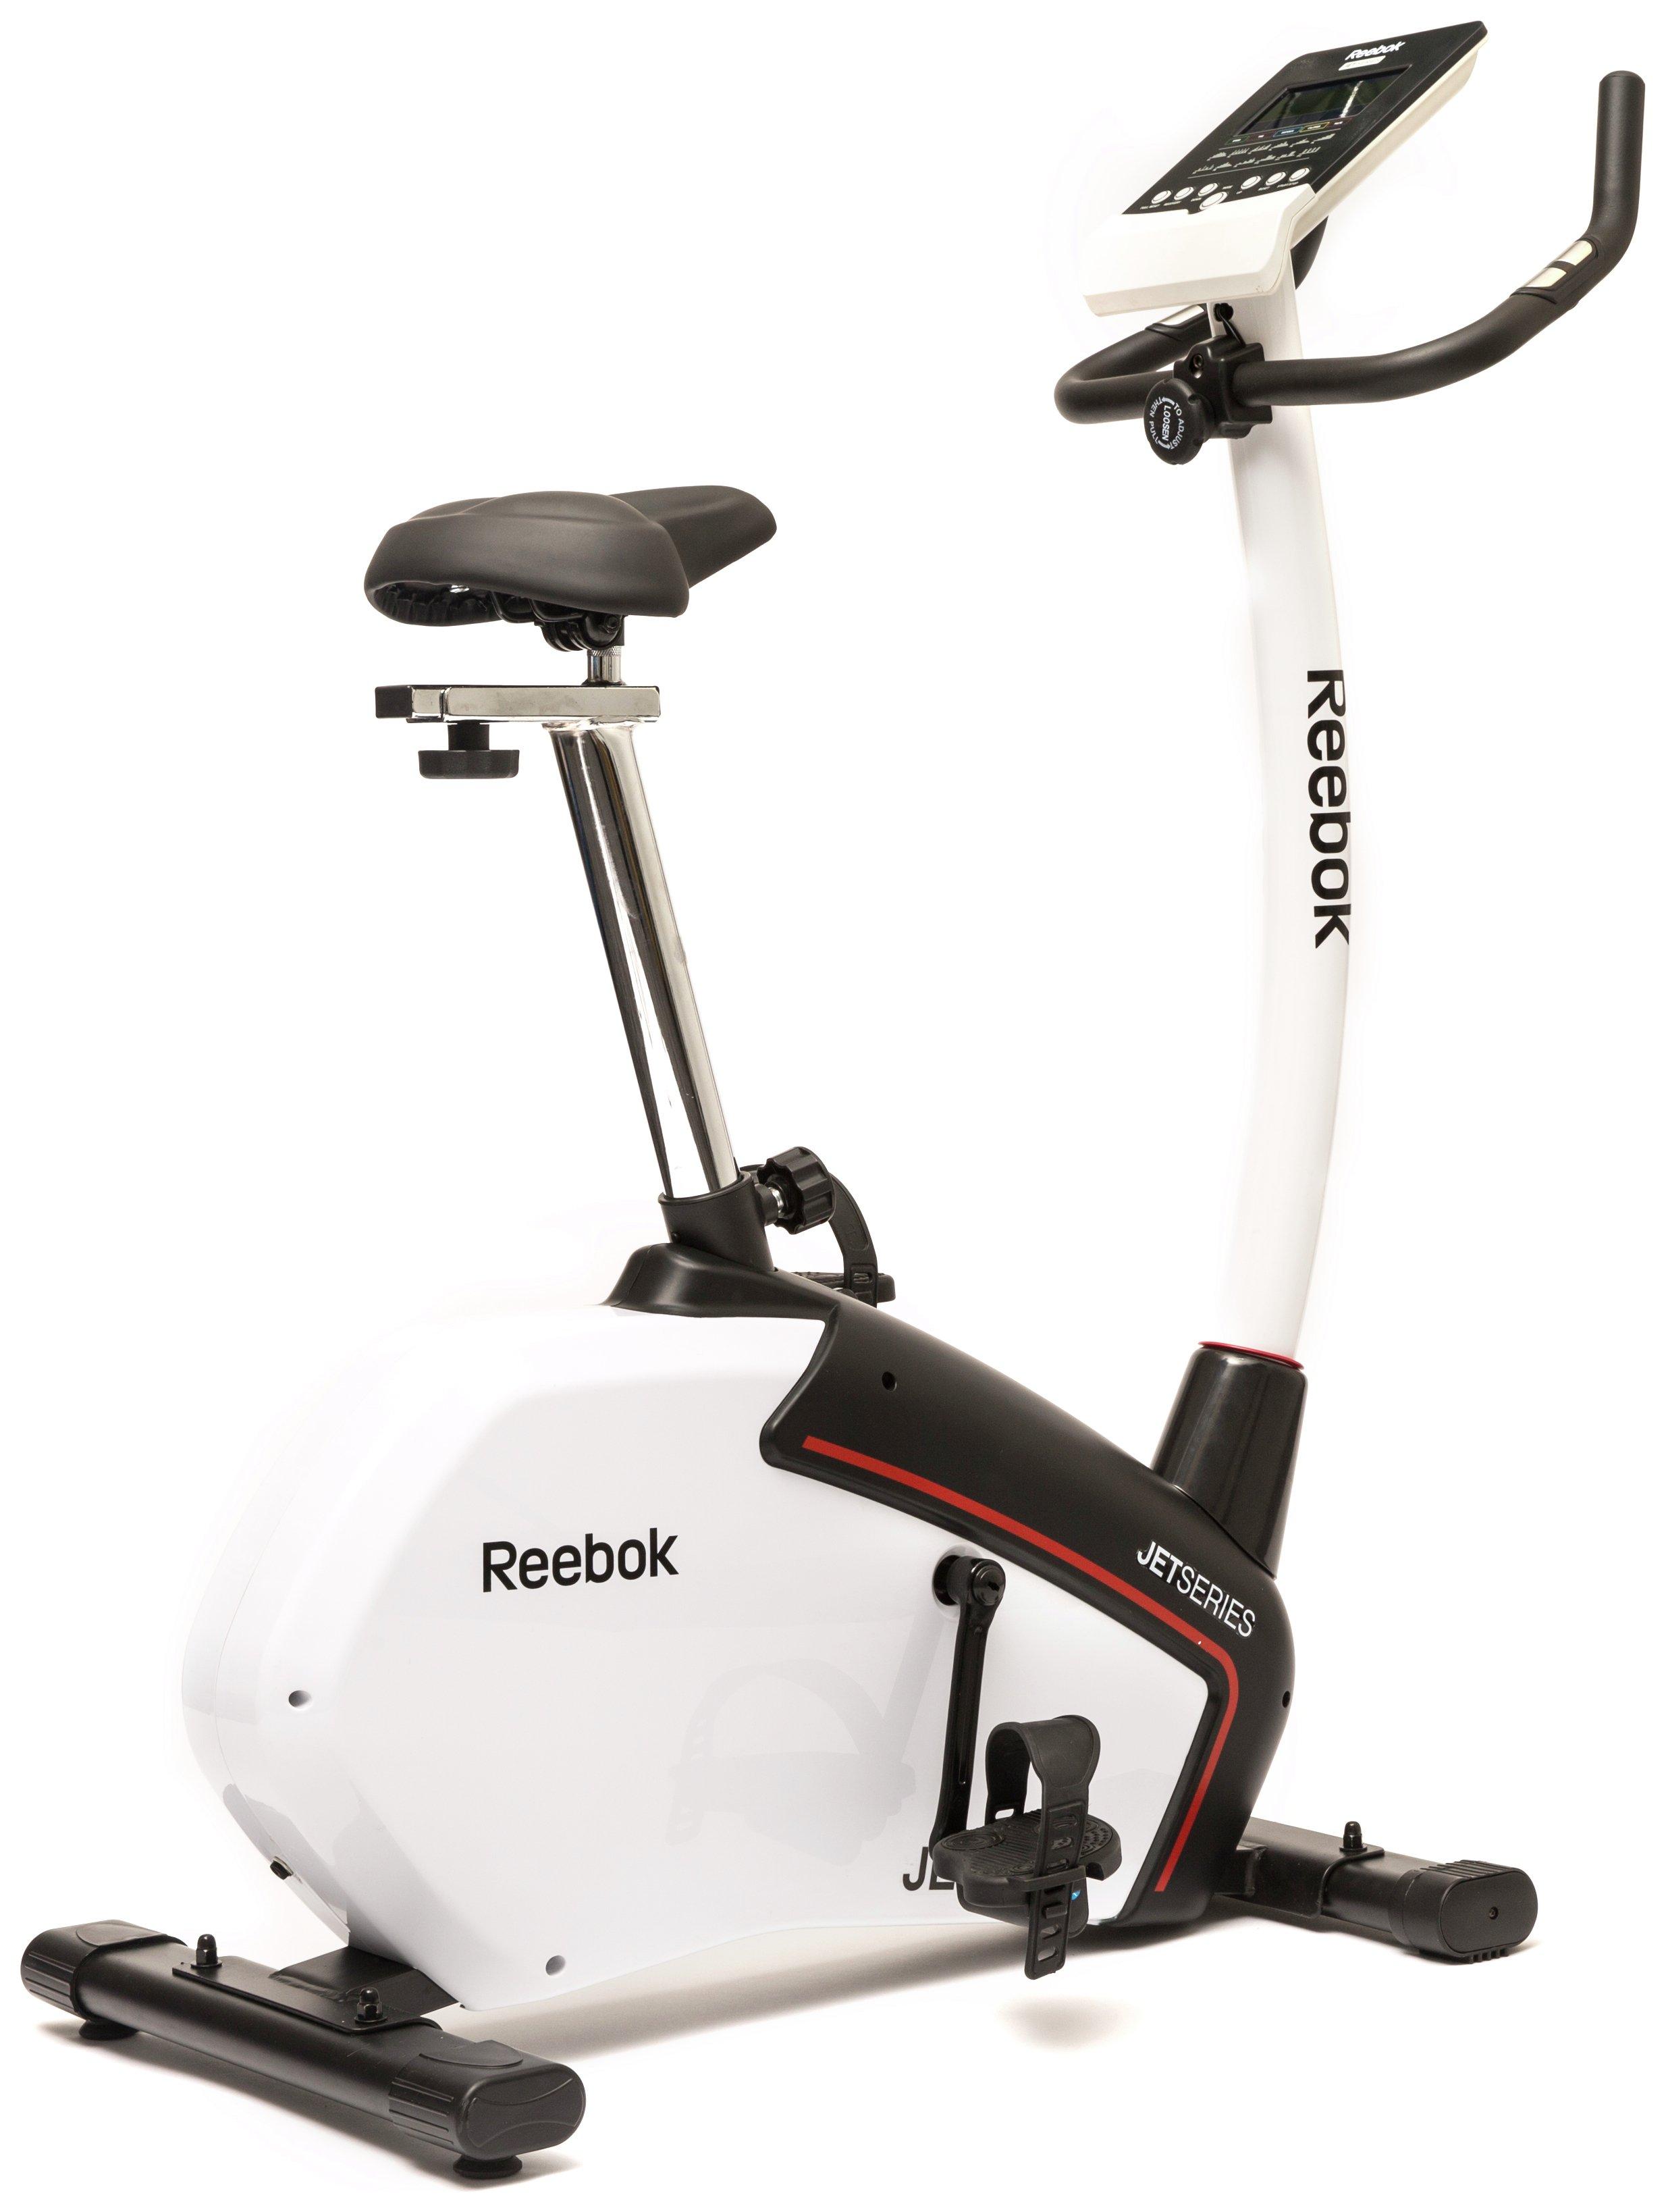 Reebok - Jet 100 Exercise Bike